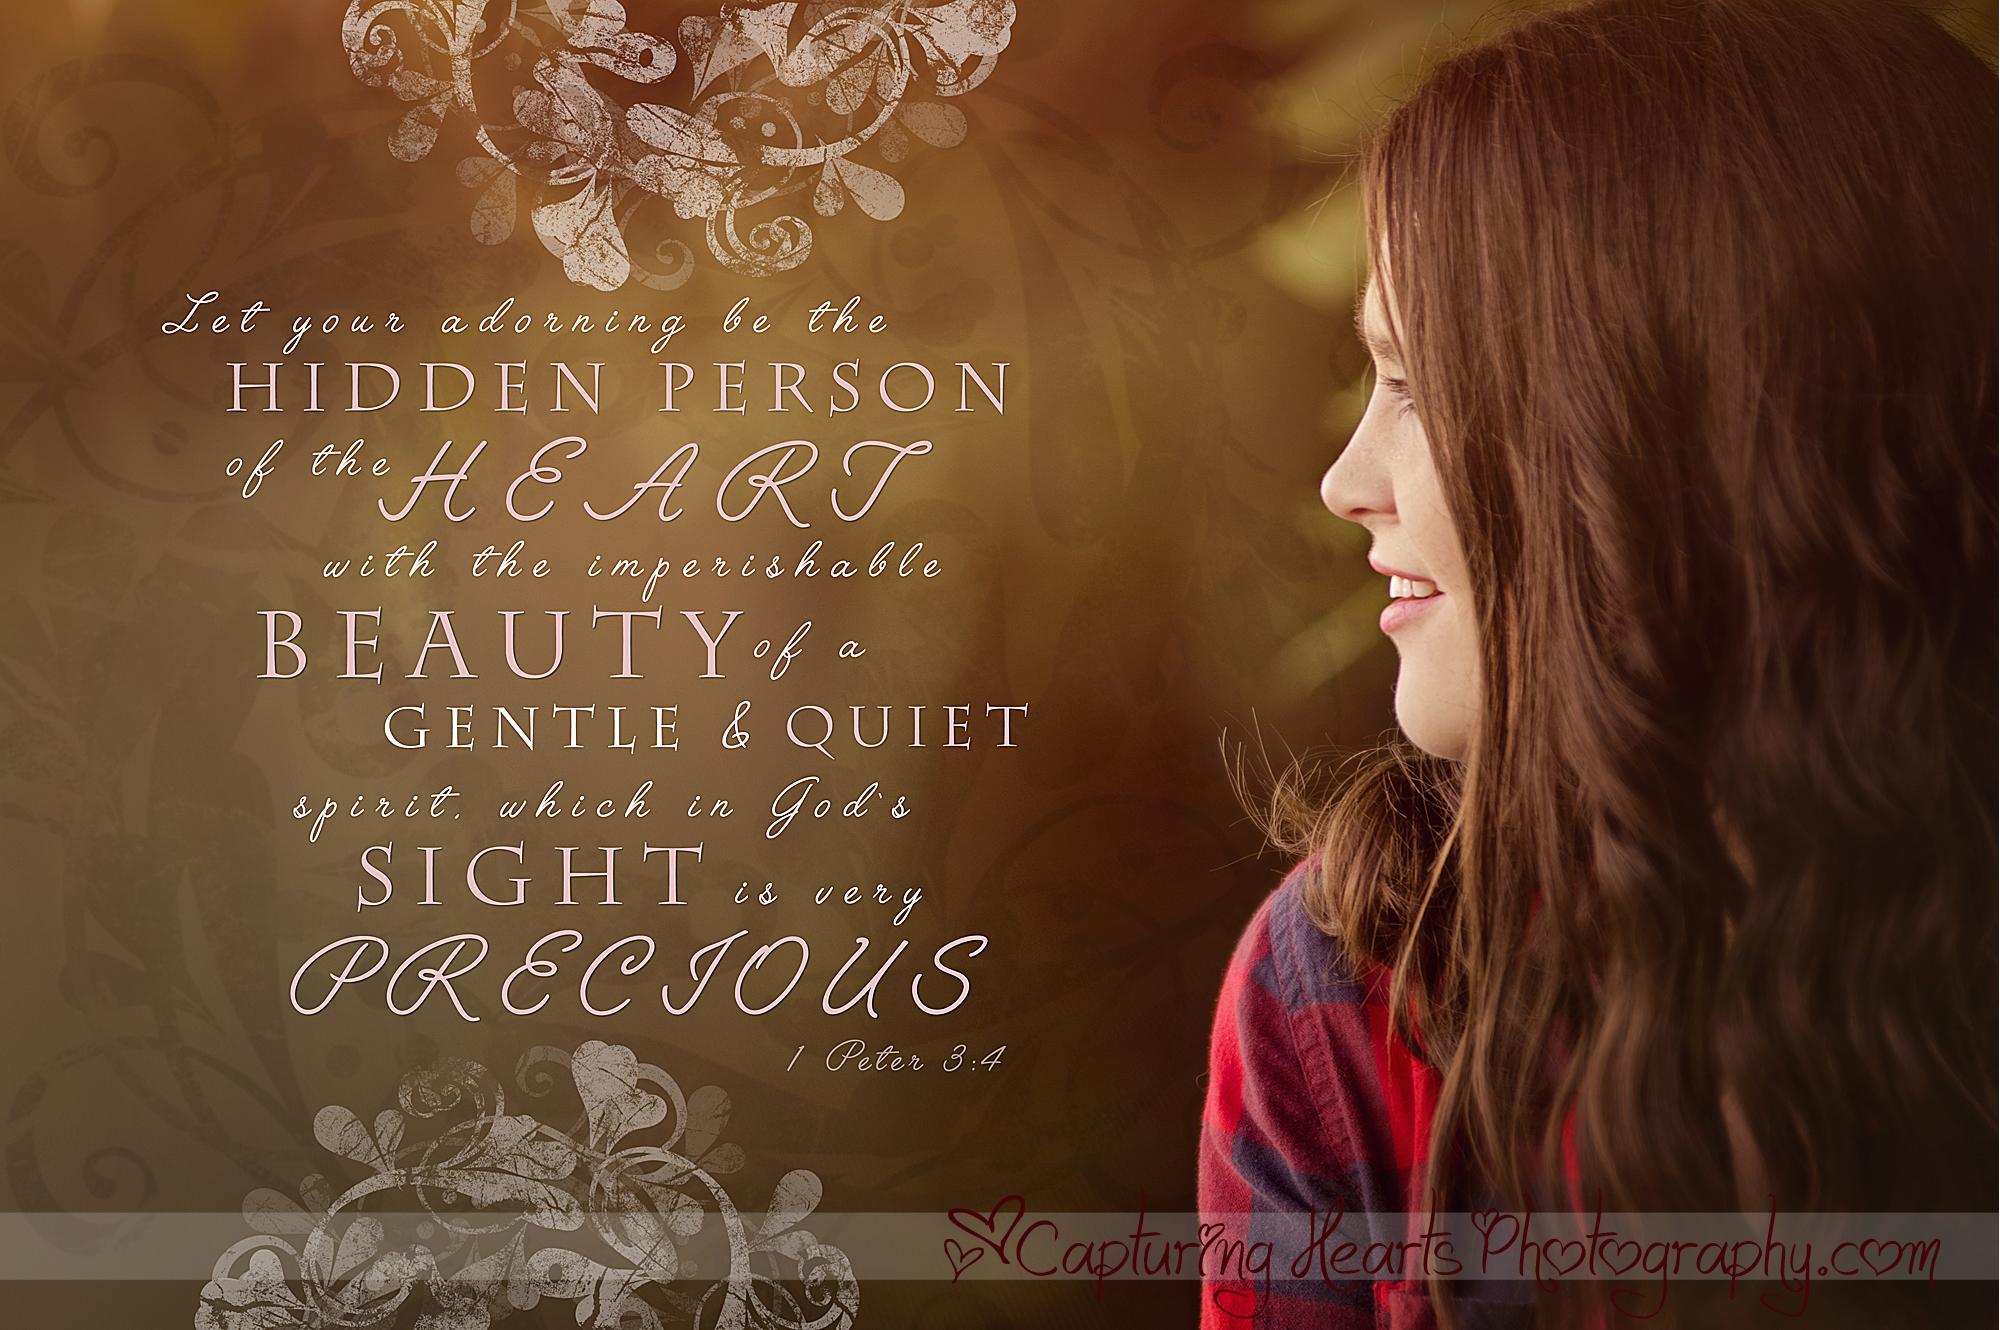 inner beauty bible verse web